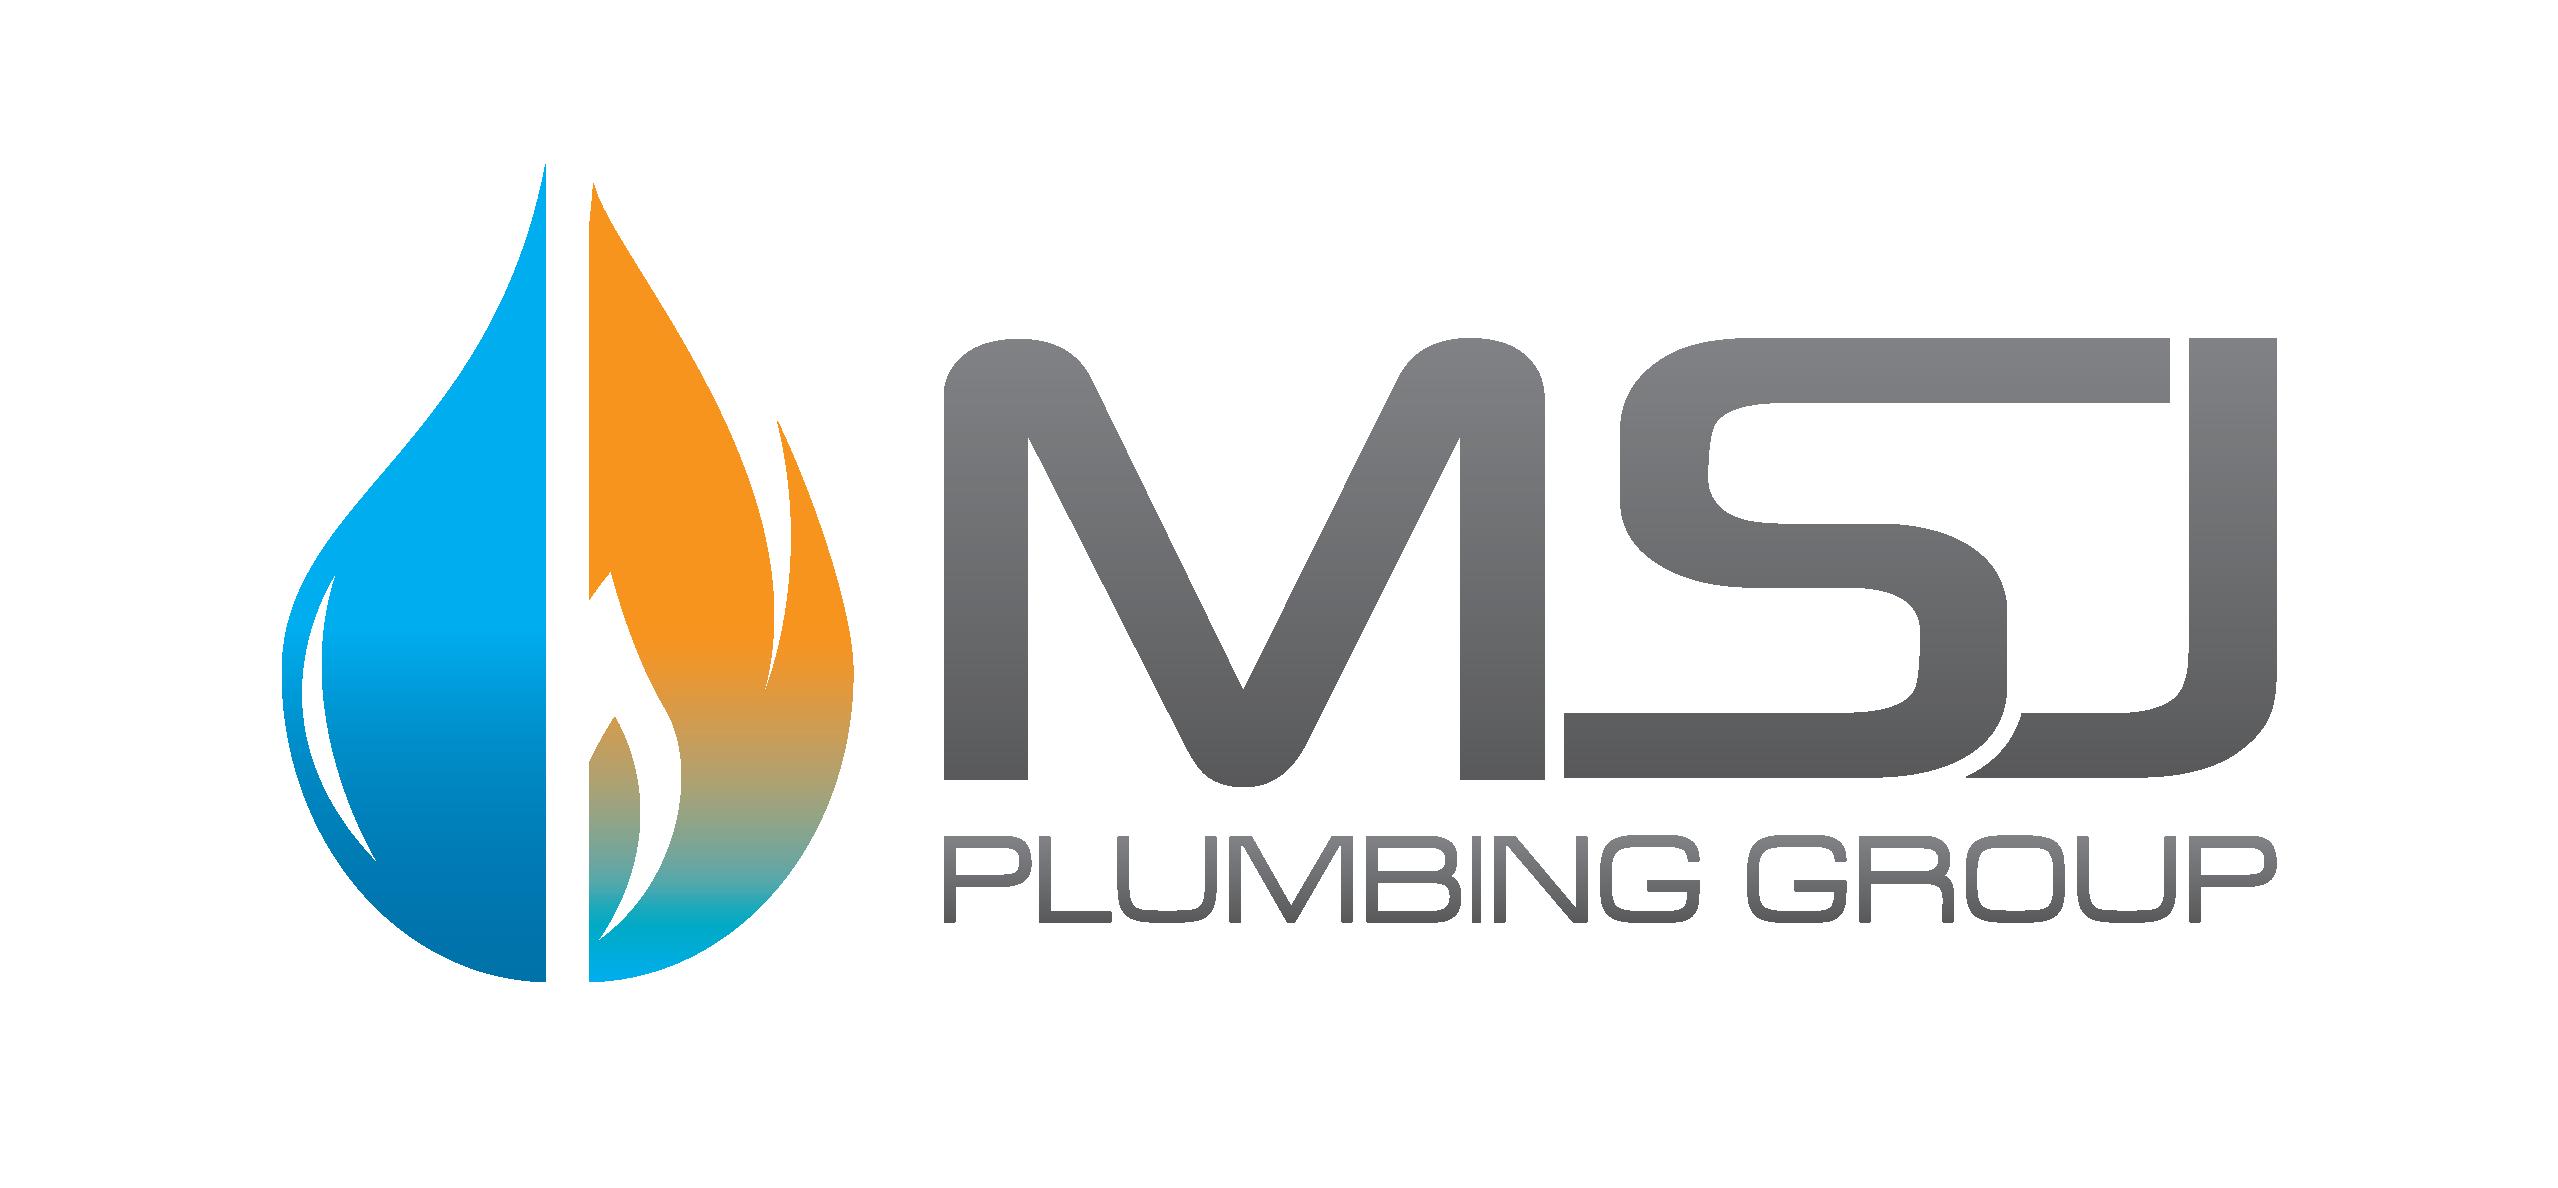 MSJ_plumbing_canberra